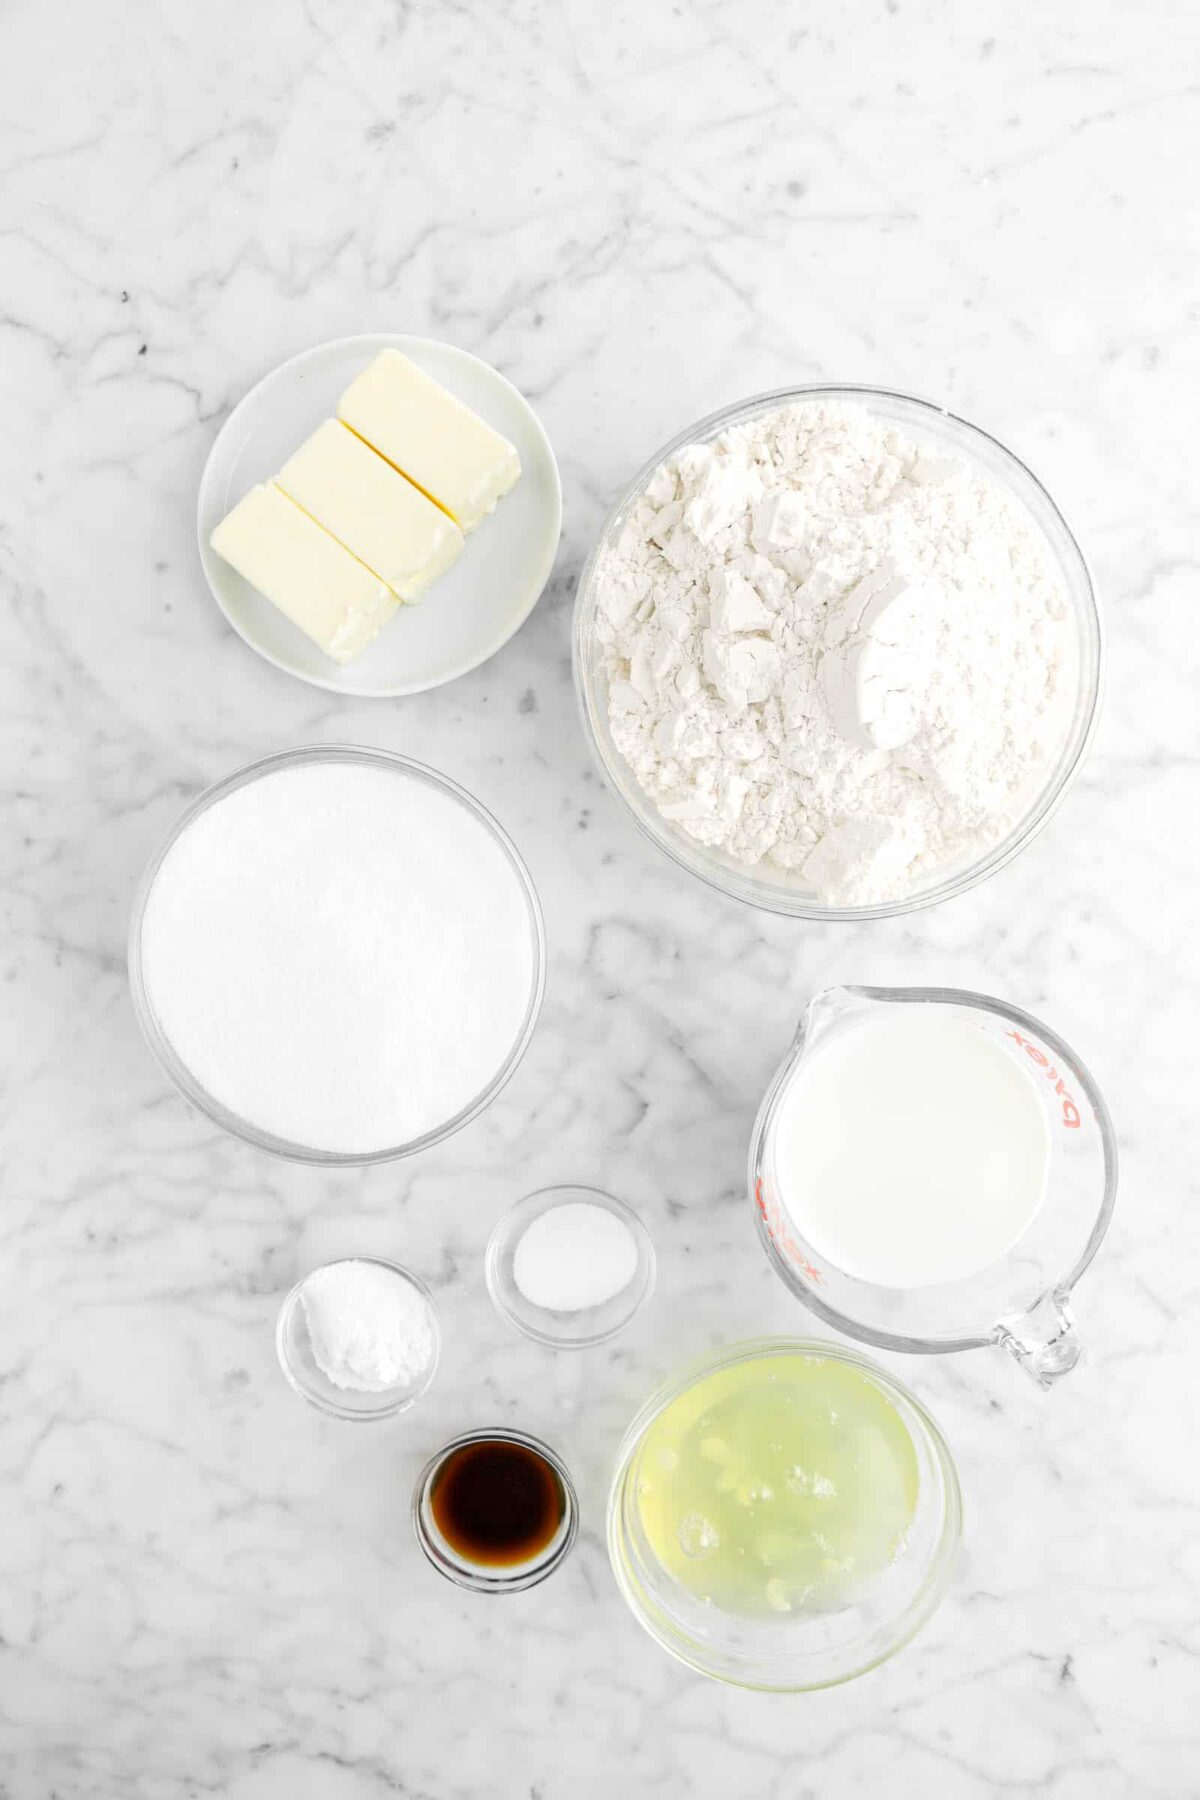 butter, flour, sugar, milk, baking powder, salt, vanilla, and egg whites on marble counter